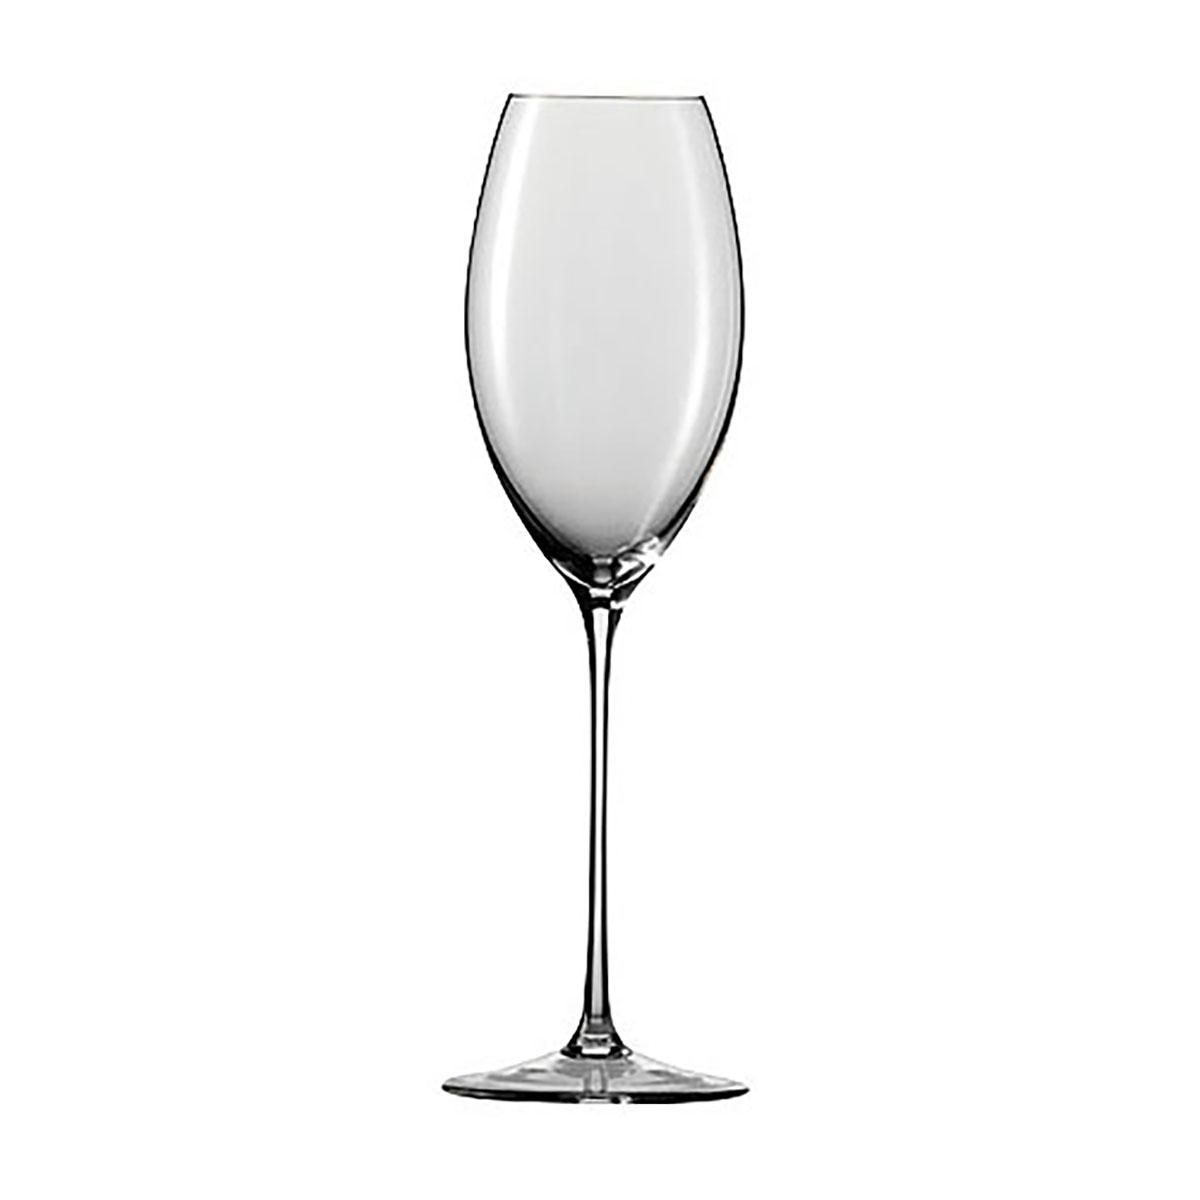 Schott Zwiesel 1872 Enoteca Champagne, Pair